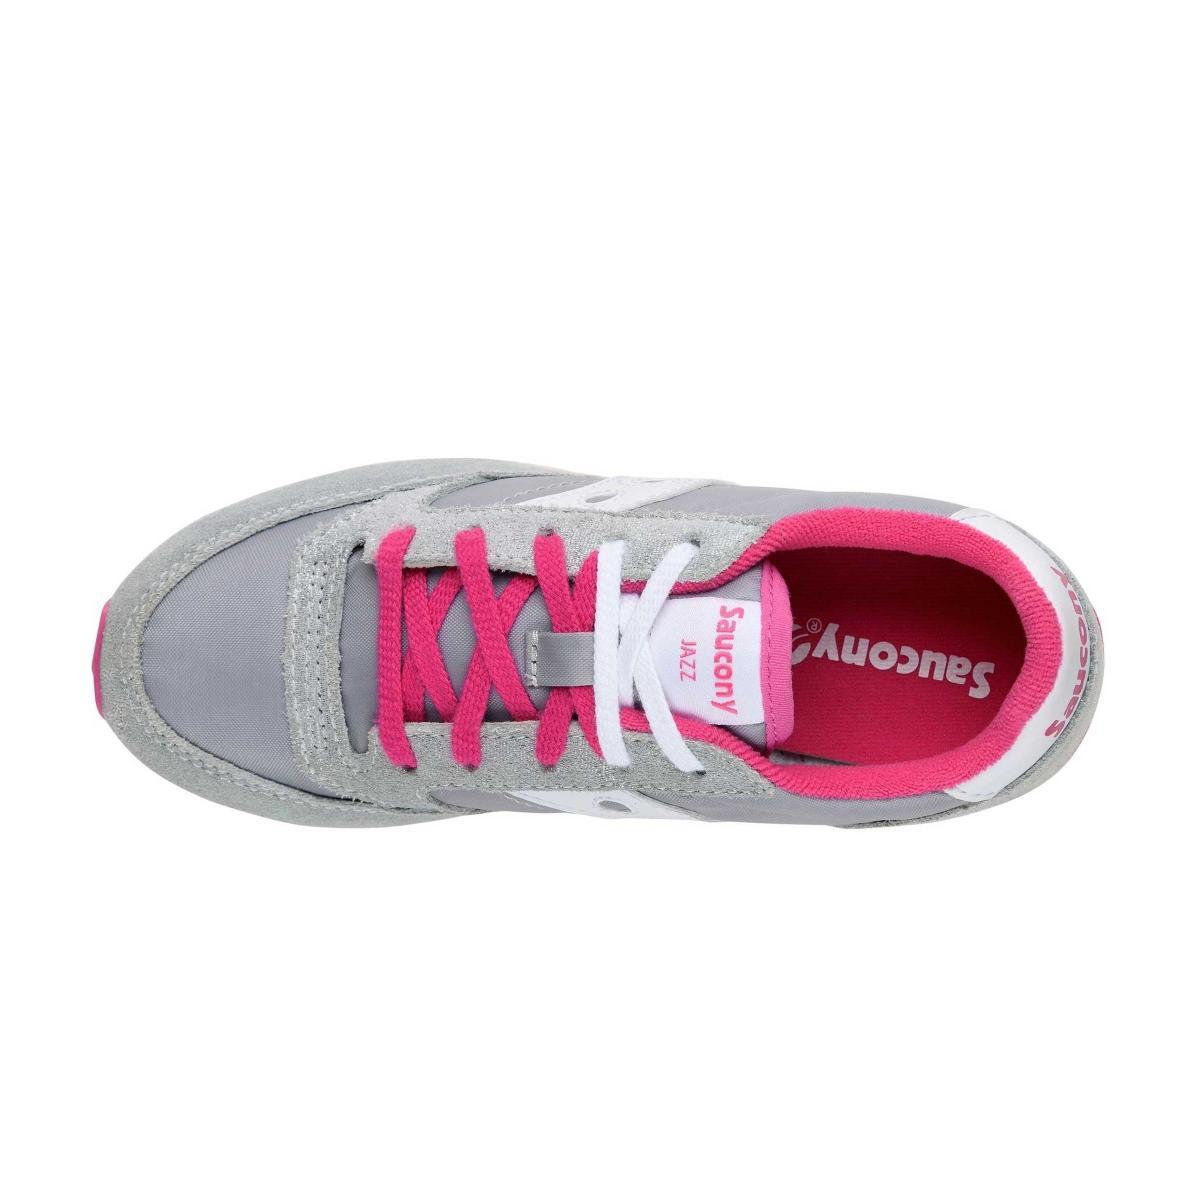 Scarpe Sneakers Saucony JAZZ ORIGINAL SILVER/GREY da bambina/ragazza rif. SK161005